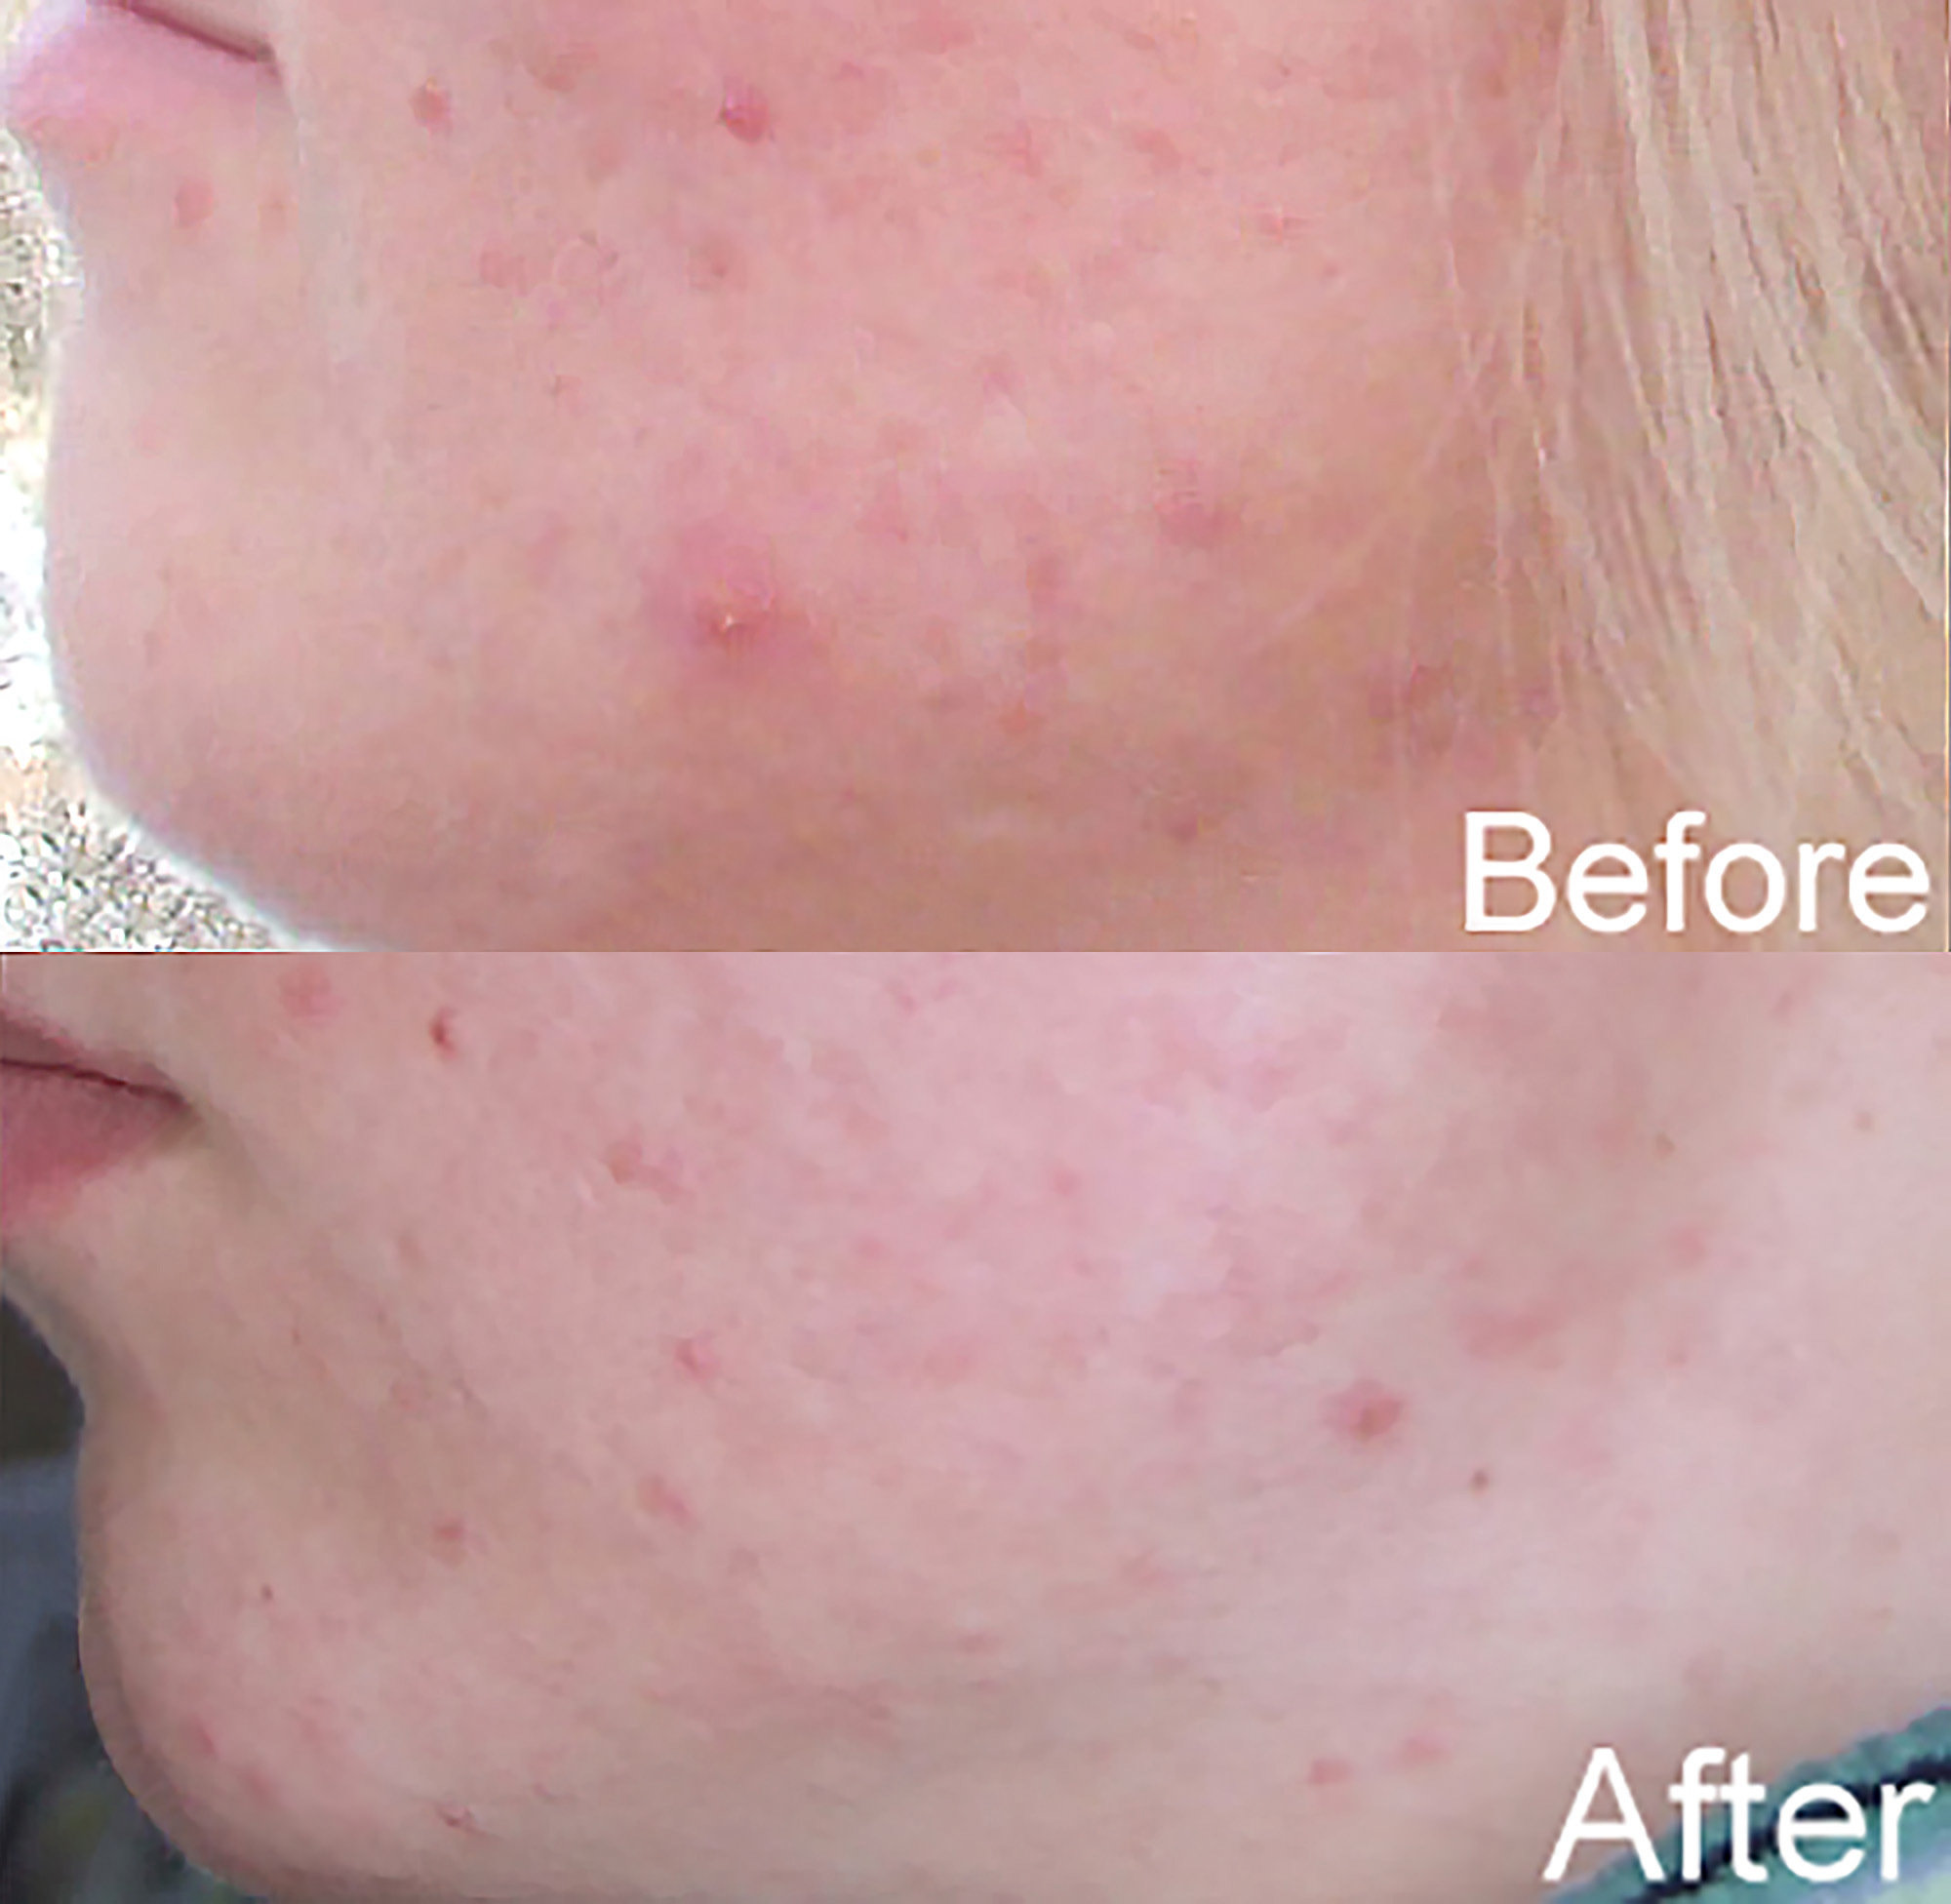 Acne treated with blue LEDs